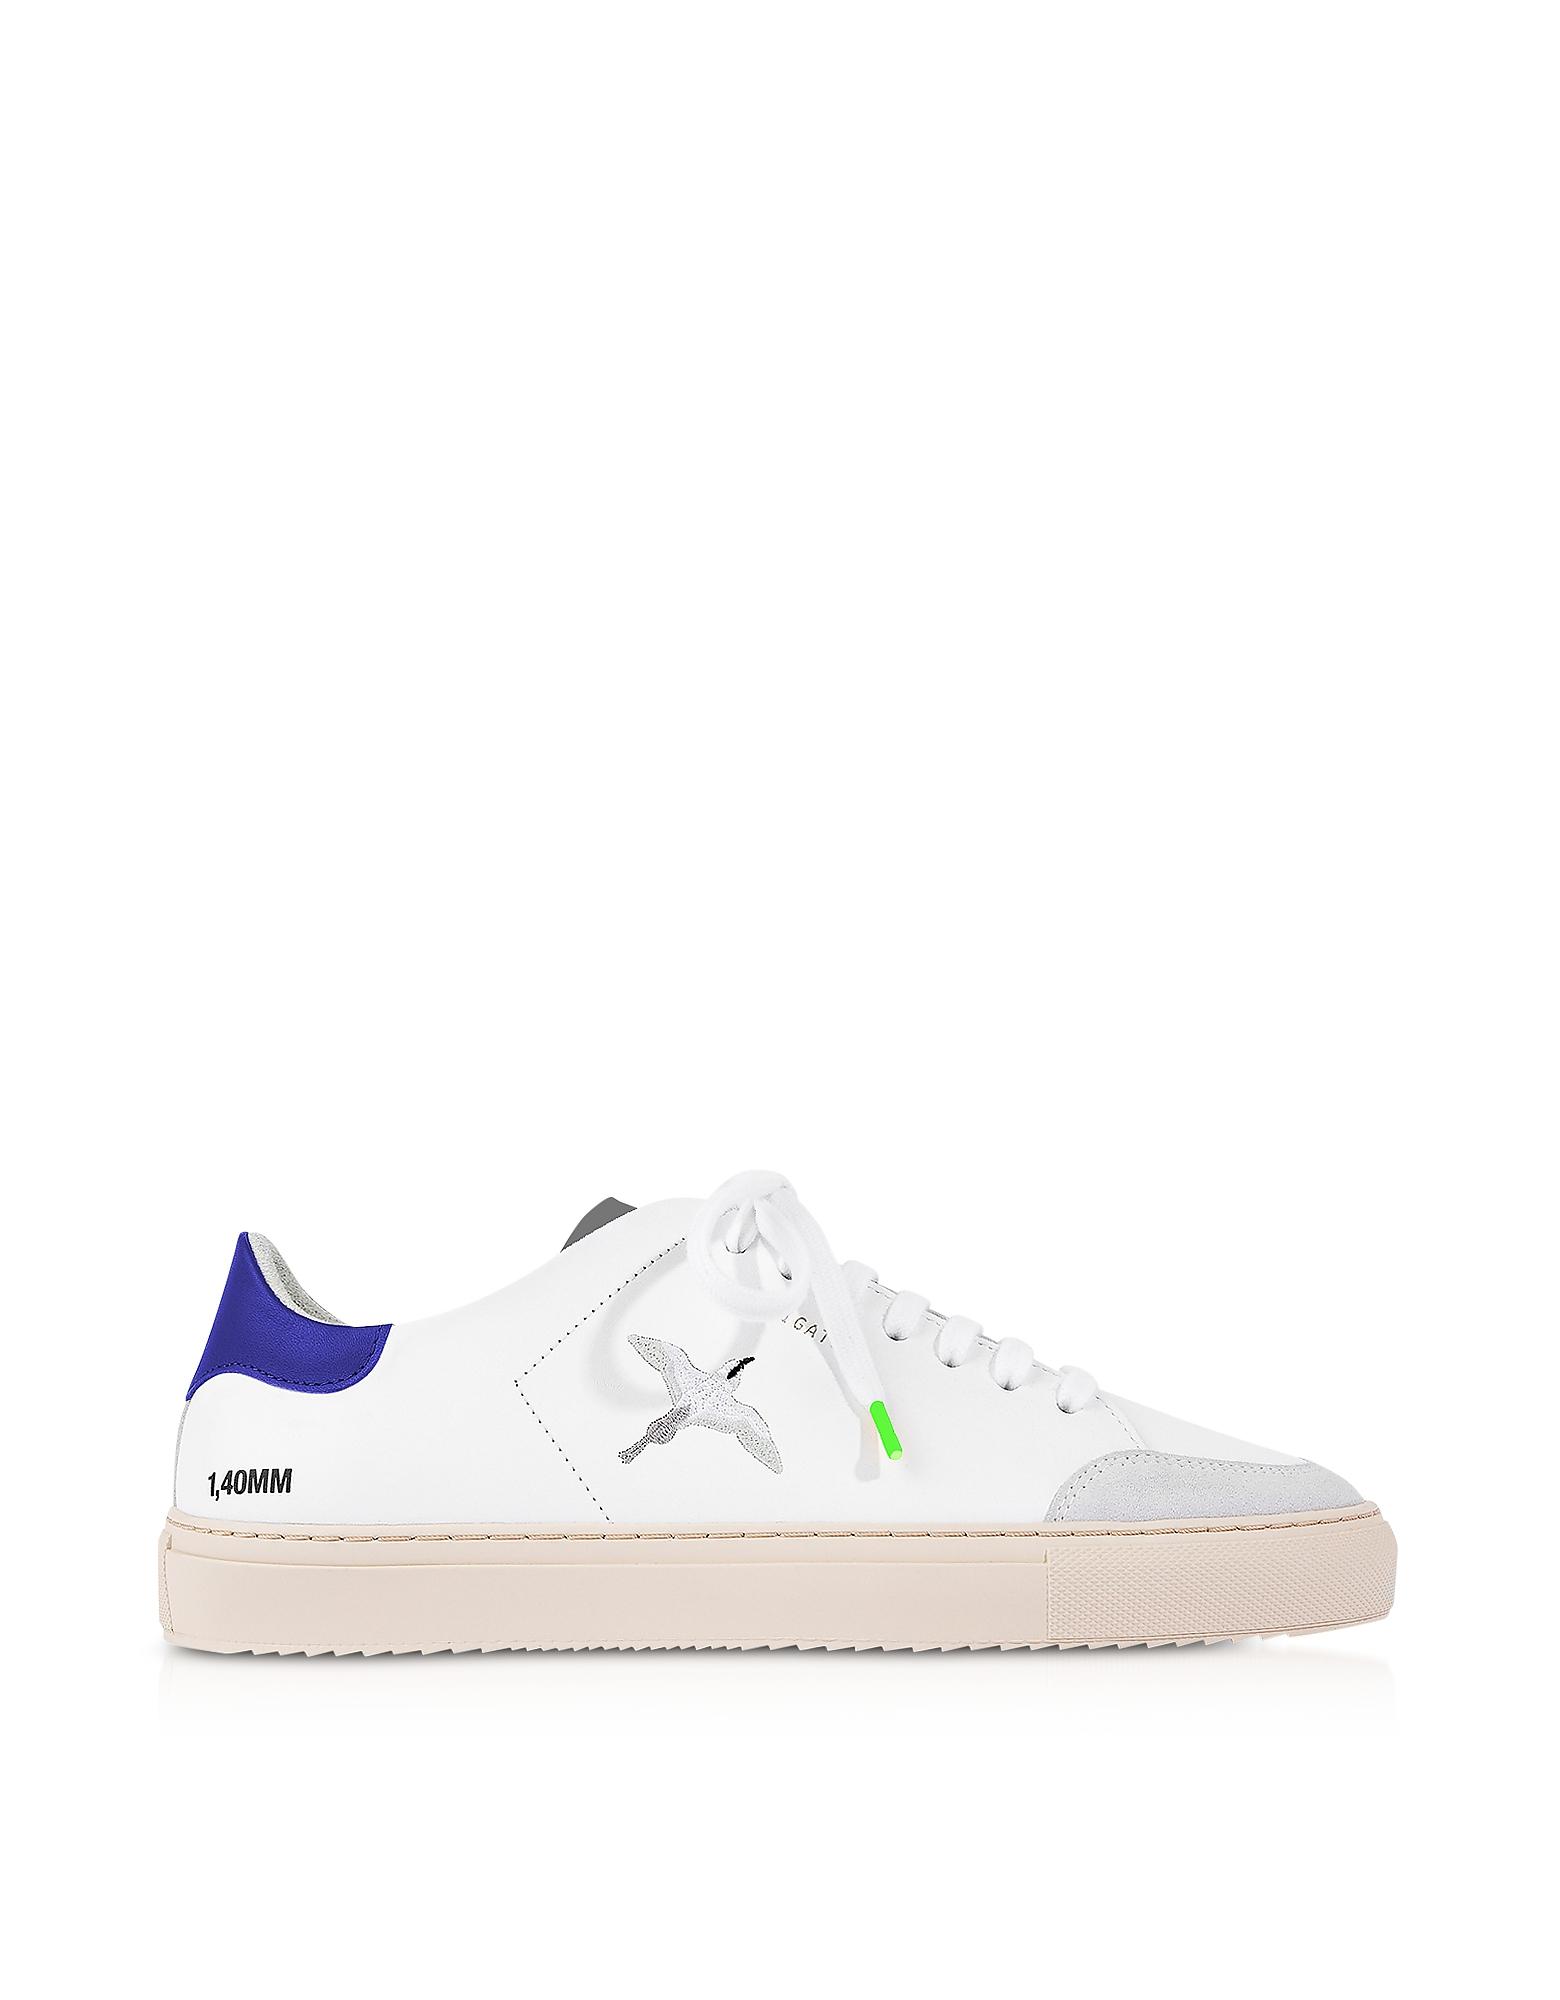 Clean 90 Triple Bird White, Cobalt Blue, Grey Leather Men's Sneakers